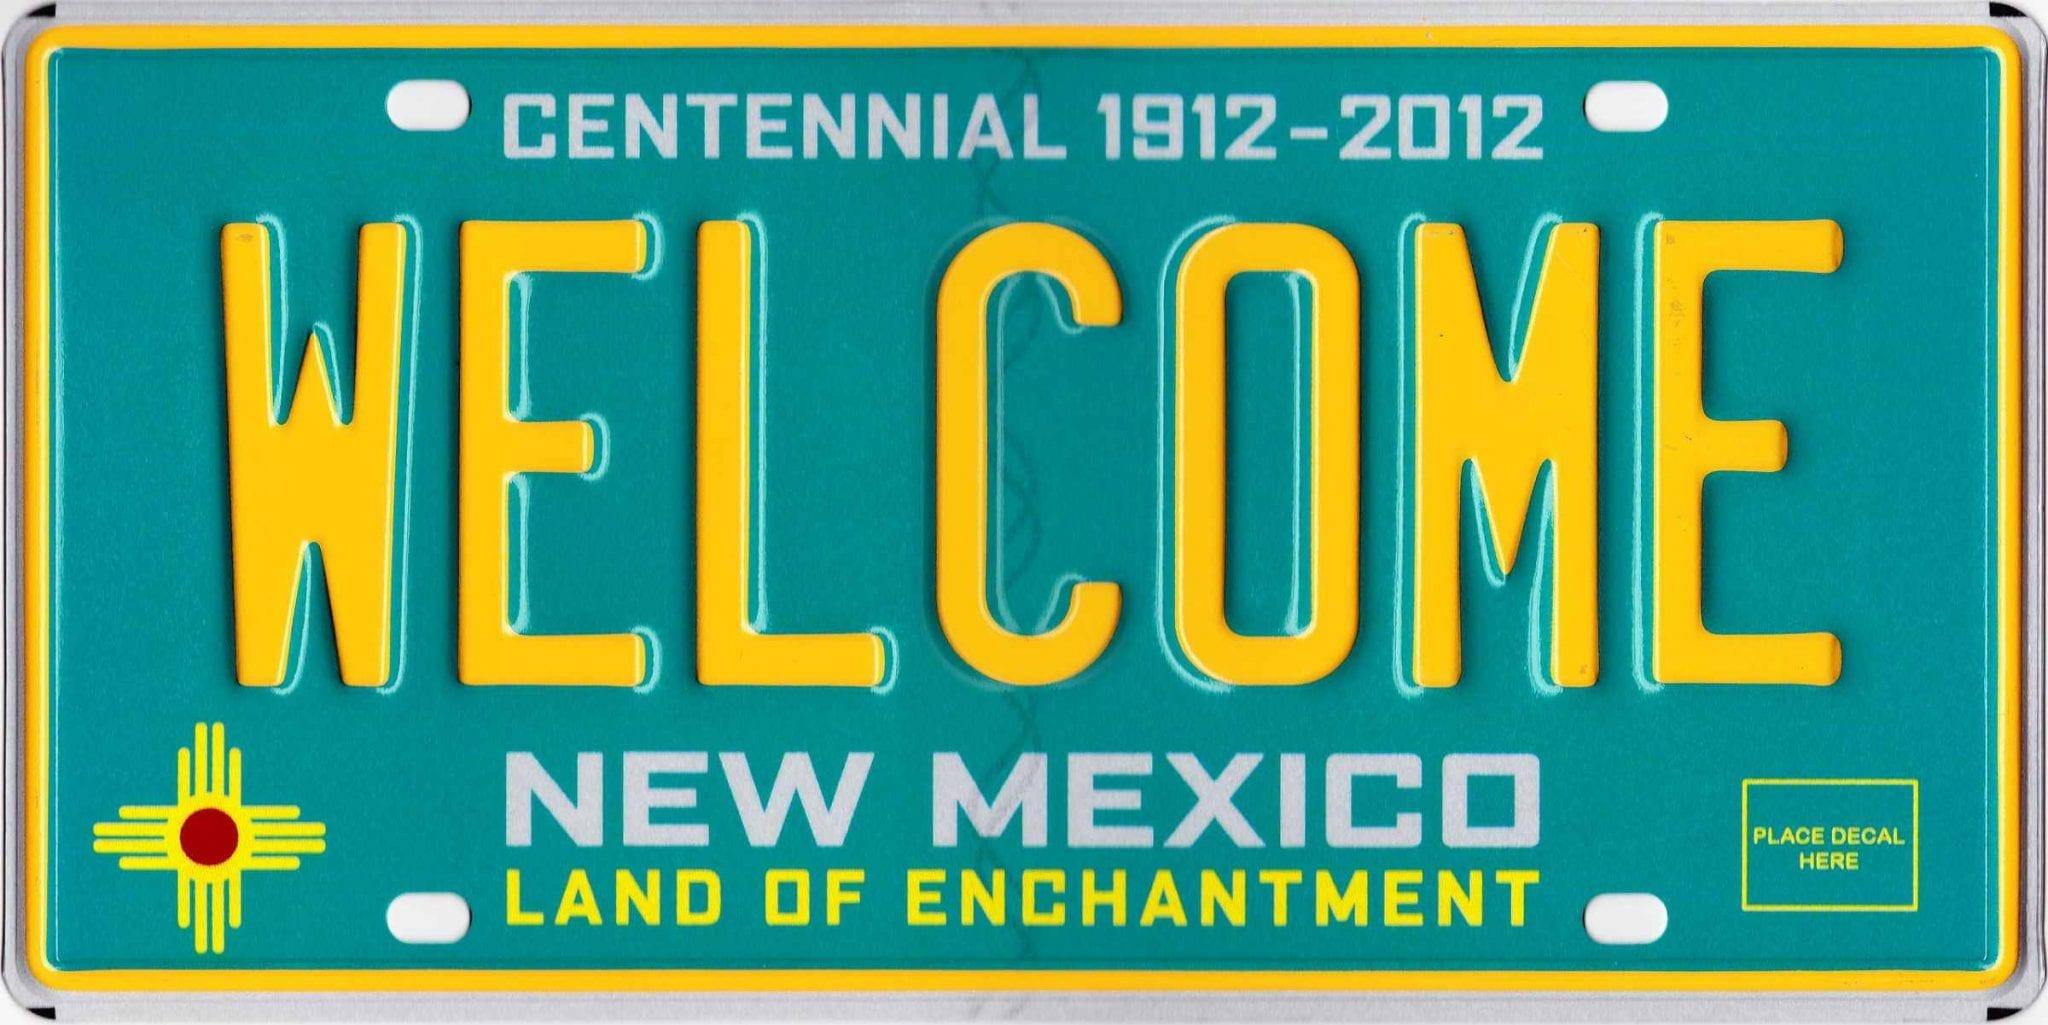 New Mexico seeks public i input on climate change